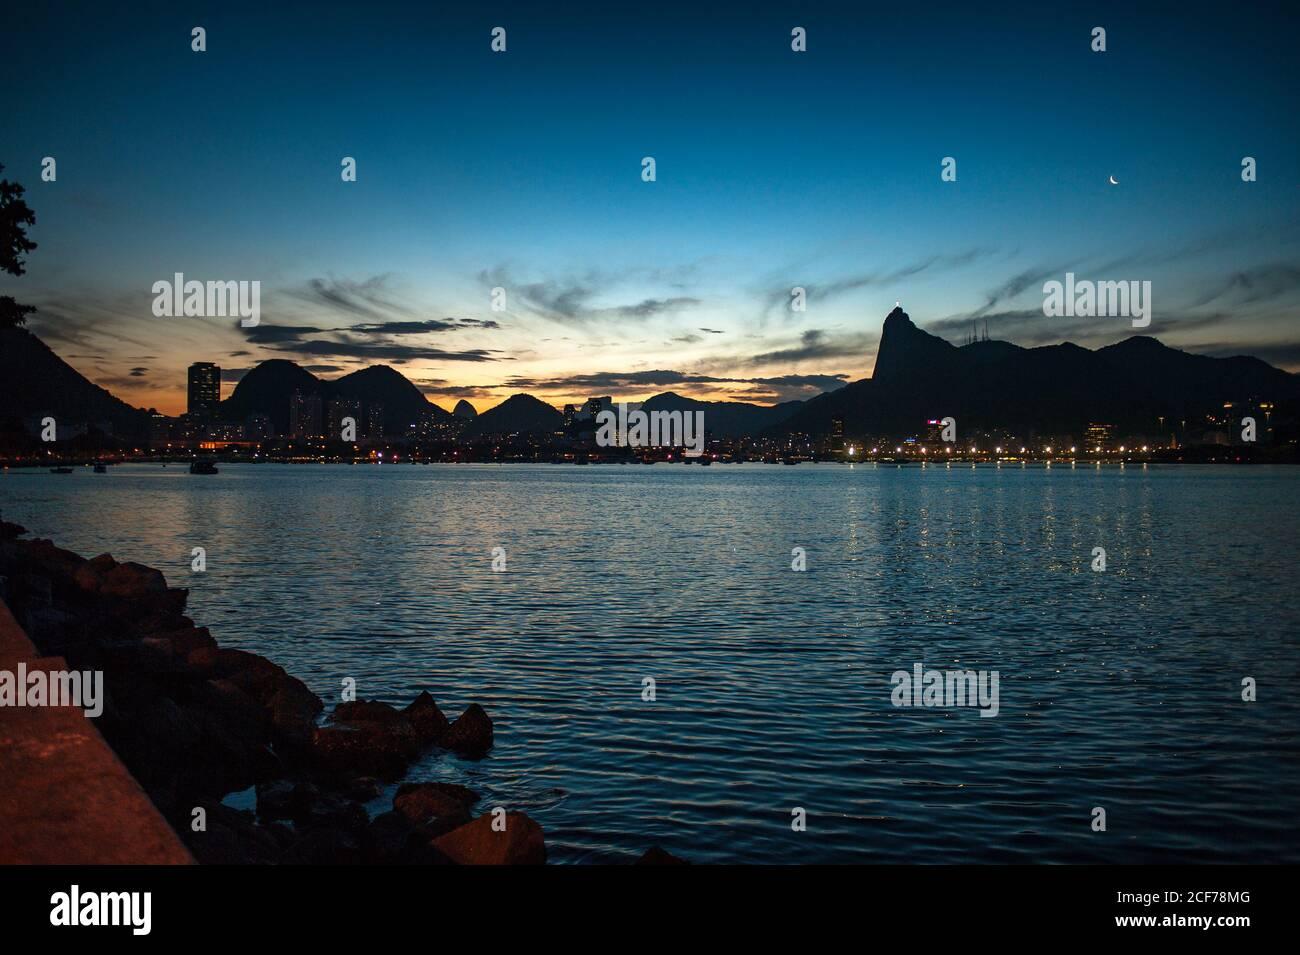 Nice views of a beach in Rio de Janeiro at sunset Stock Photo